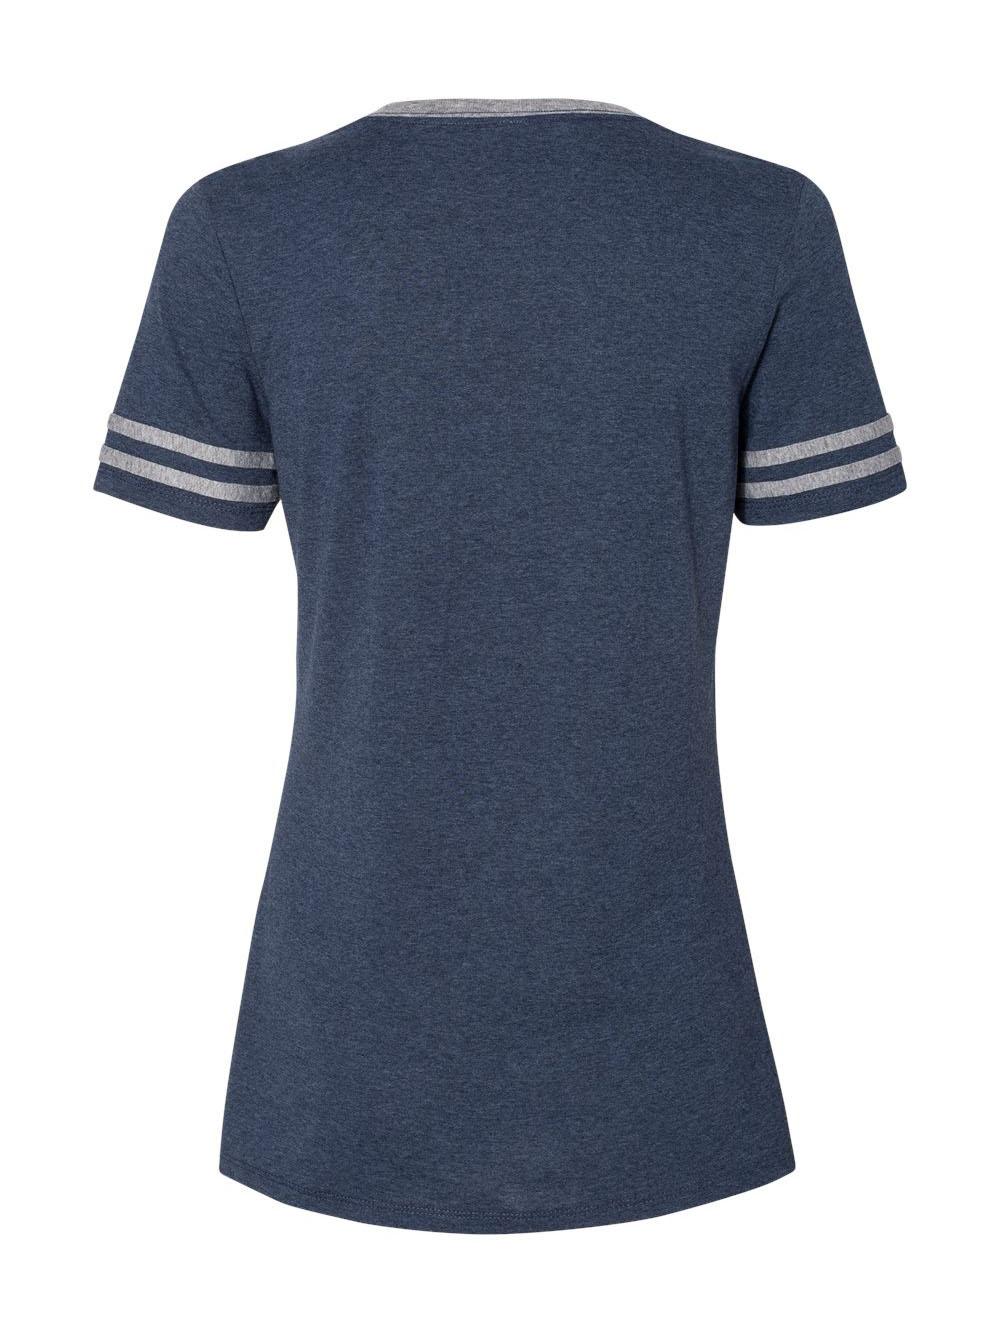 Jerzees-Triblend-Women-039-s-V-Neck-Varsity-T-Shirt-602WVR thumbnail 13